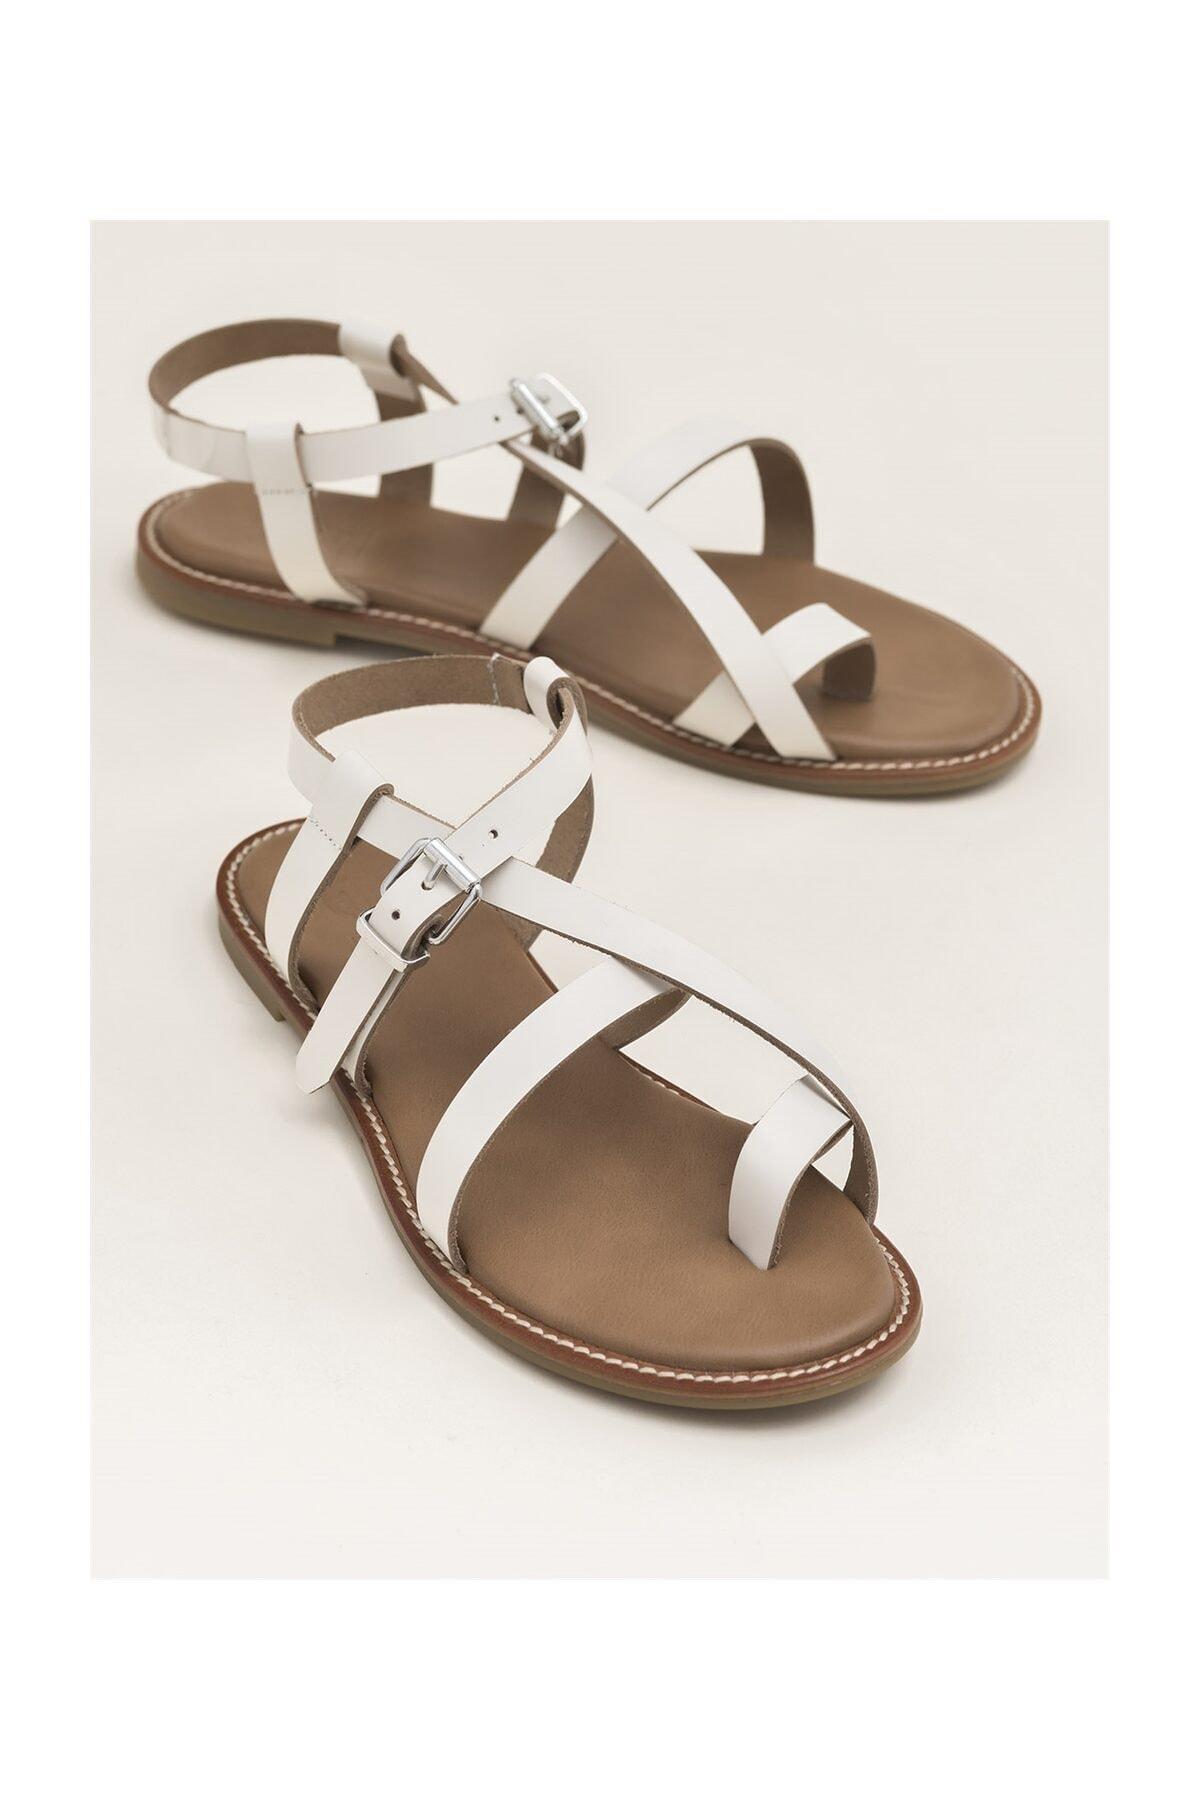 Elle Shoes Elayne Kadın Sandalet 1